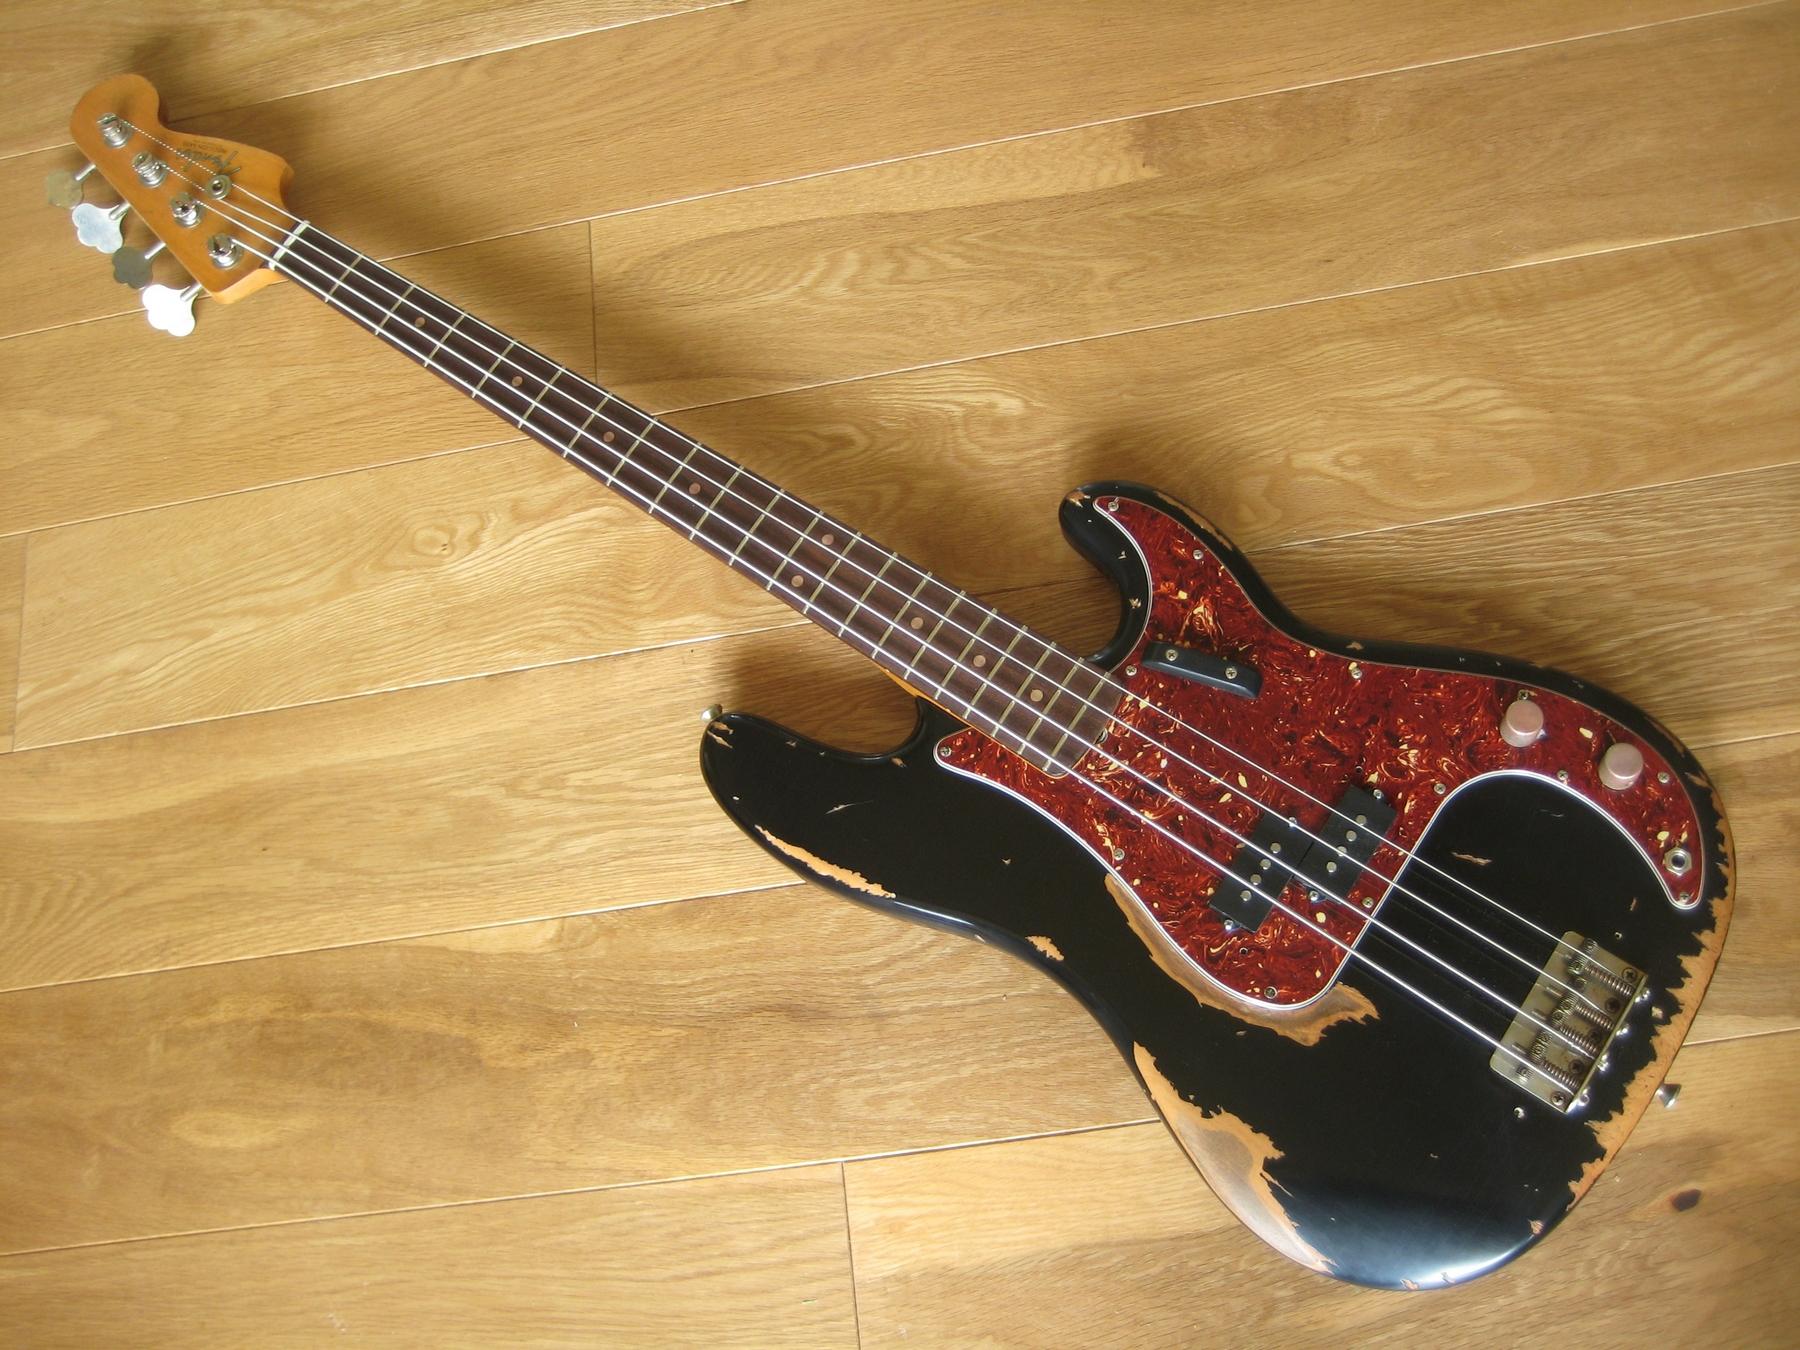 limelight p bass 00114 classic cool guitars. Black Bedroom Furniture Sets. Home Design Ideas